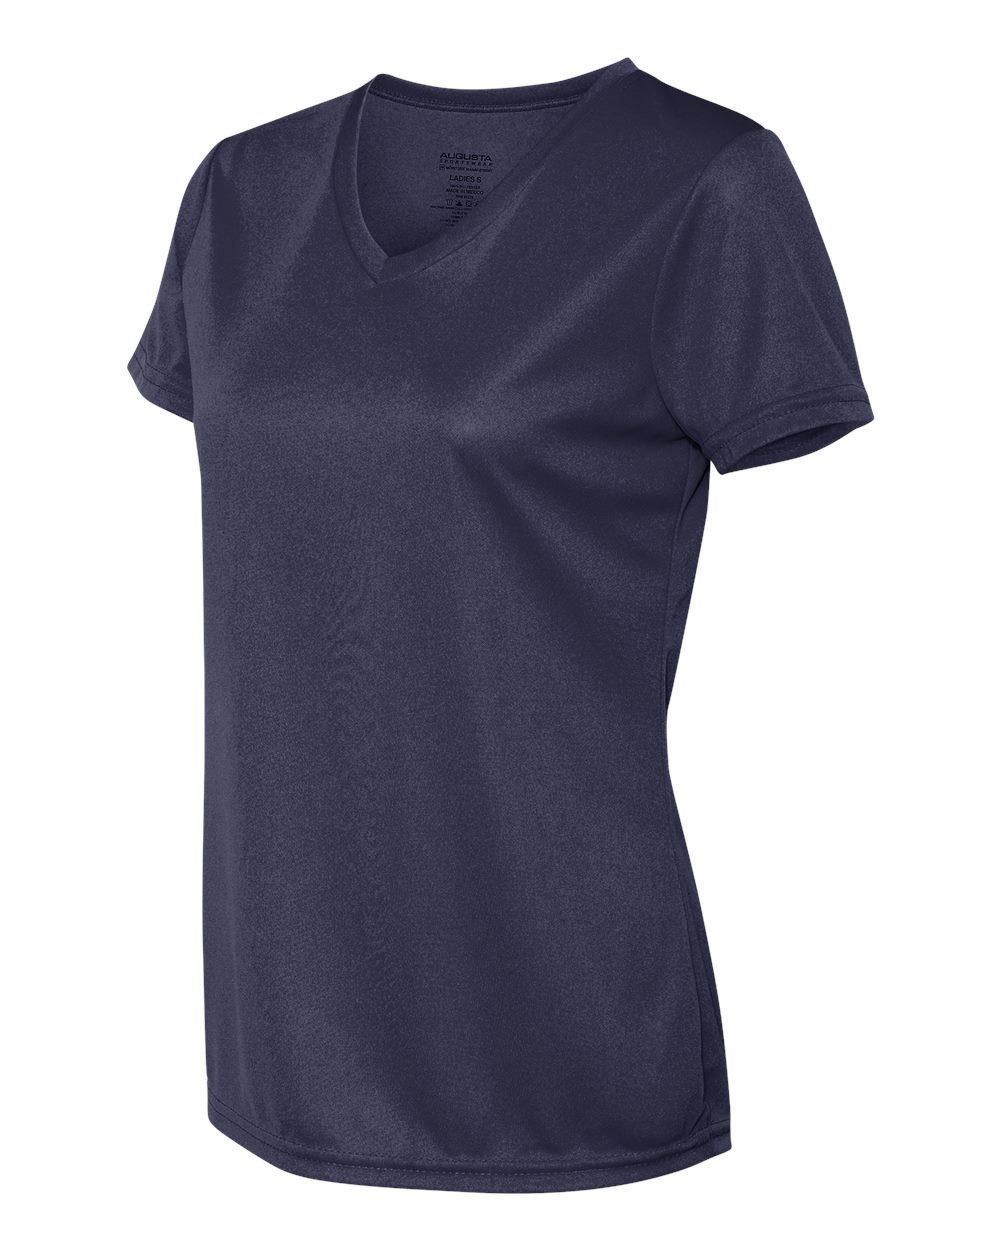 Augusta-Sportswear-Women-039-s-Moisture-Wicking-V-Neck-T-Shirt-1790-XS-2XL thumbnail 15